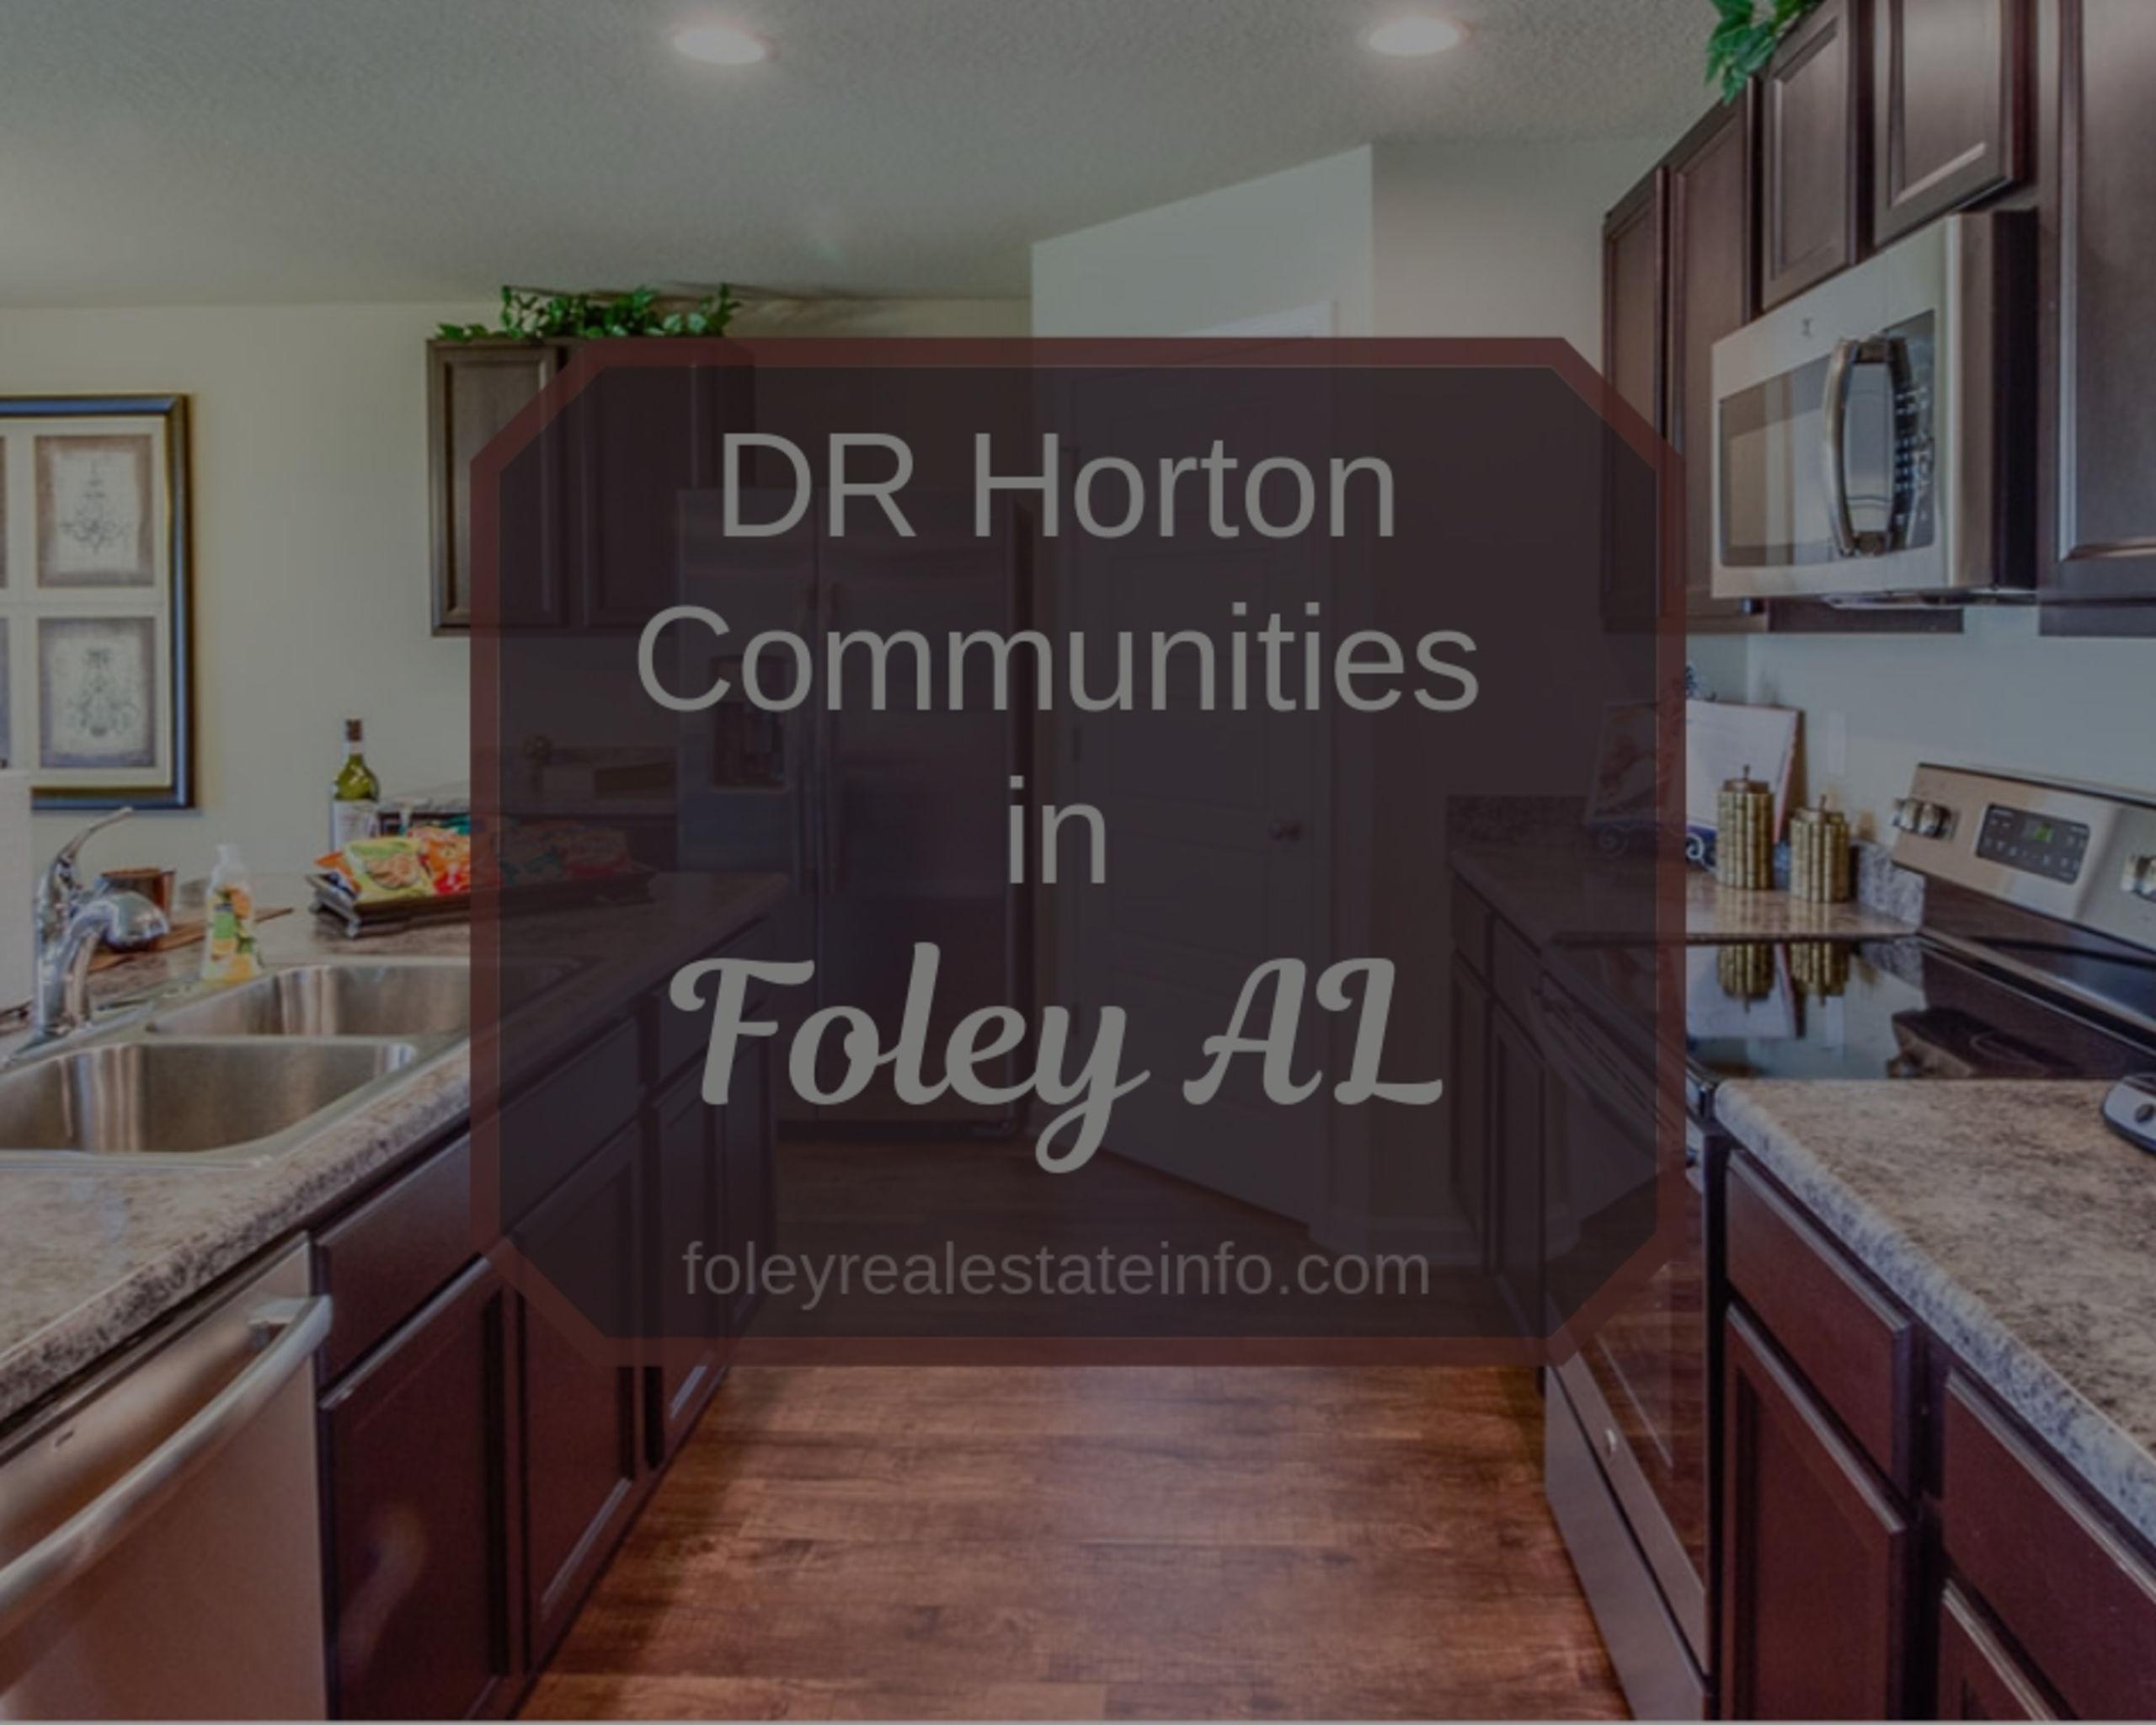 DR Horton Communities in Foley AL